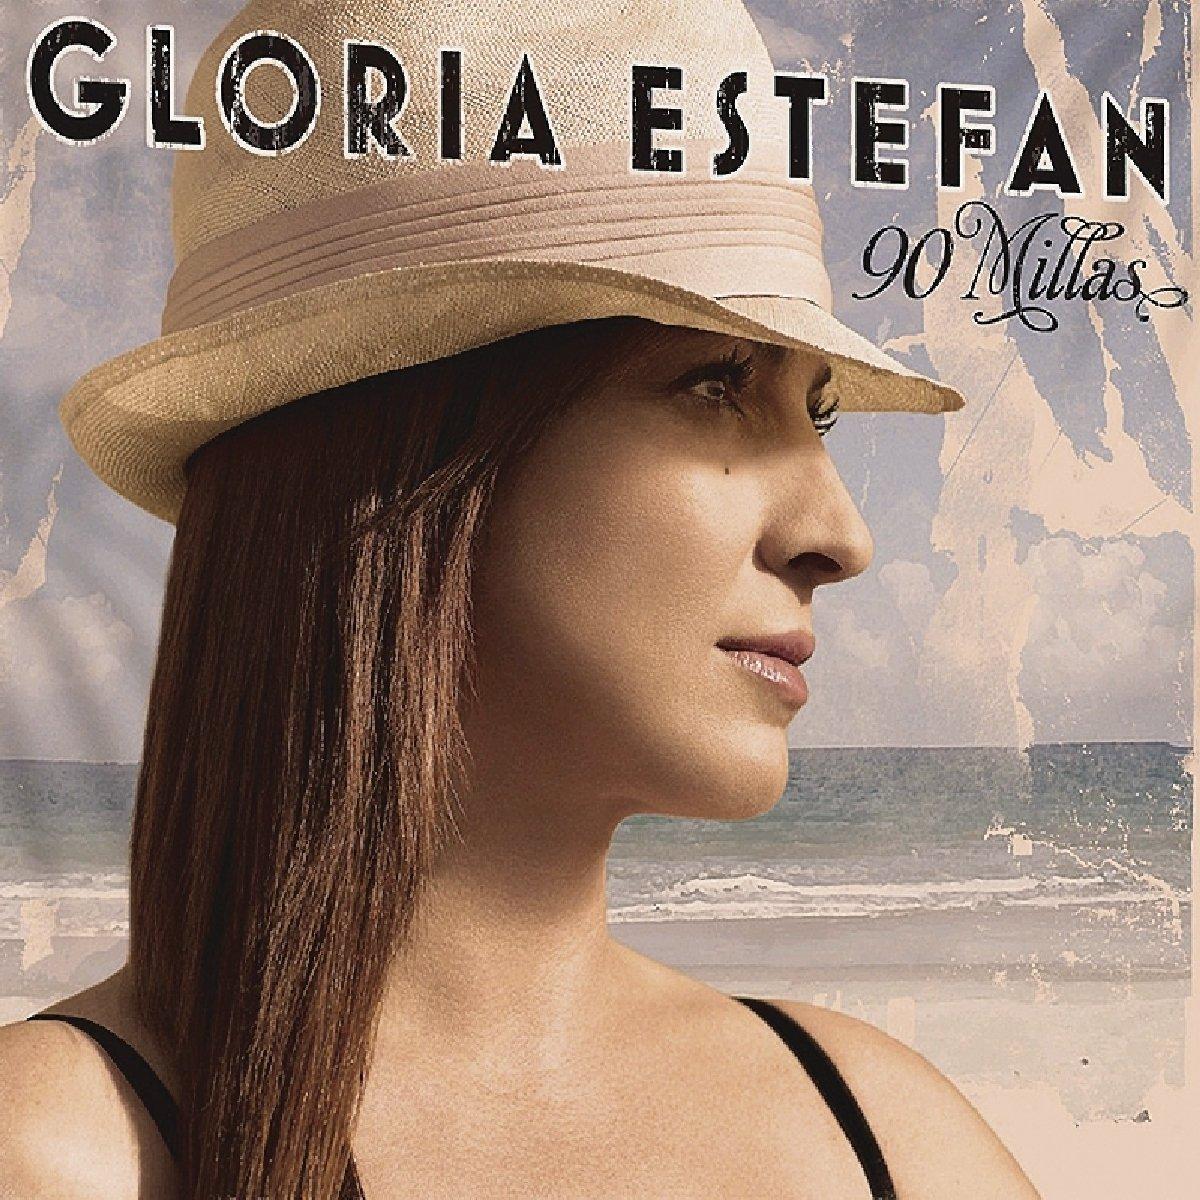 CD : Gloria Estefan - 90 Millas + 2 (Bonus Tracks, Holland - Import)